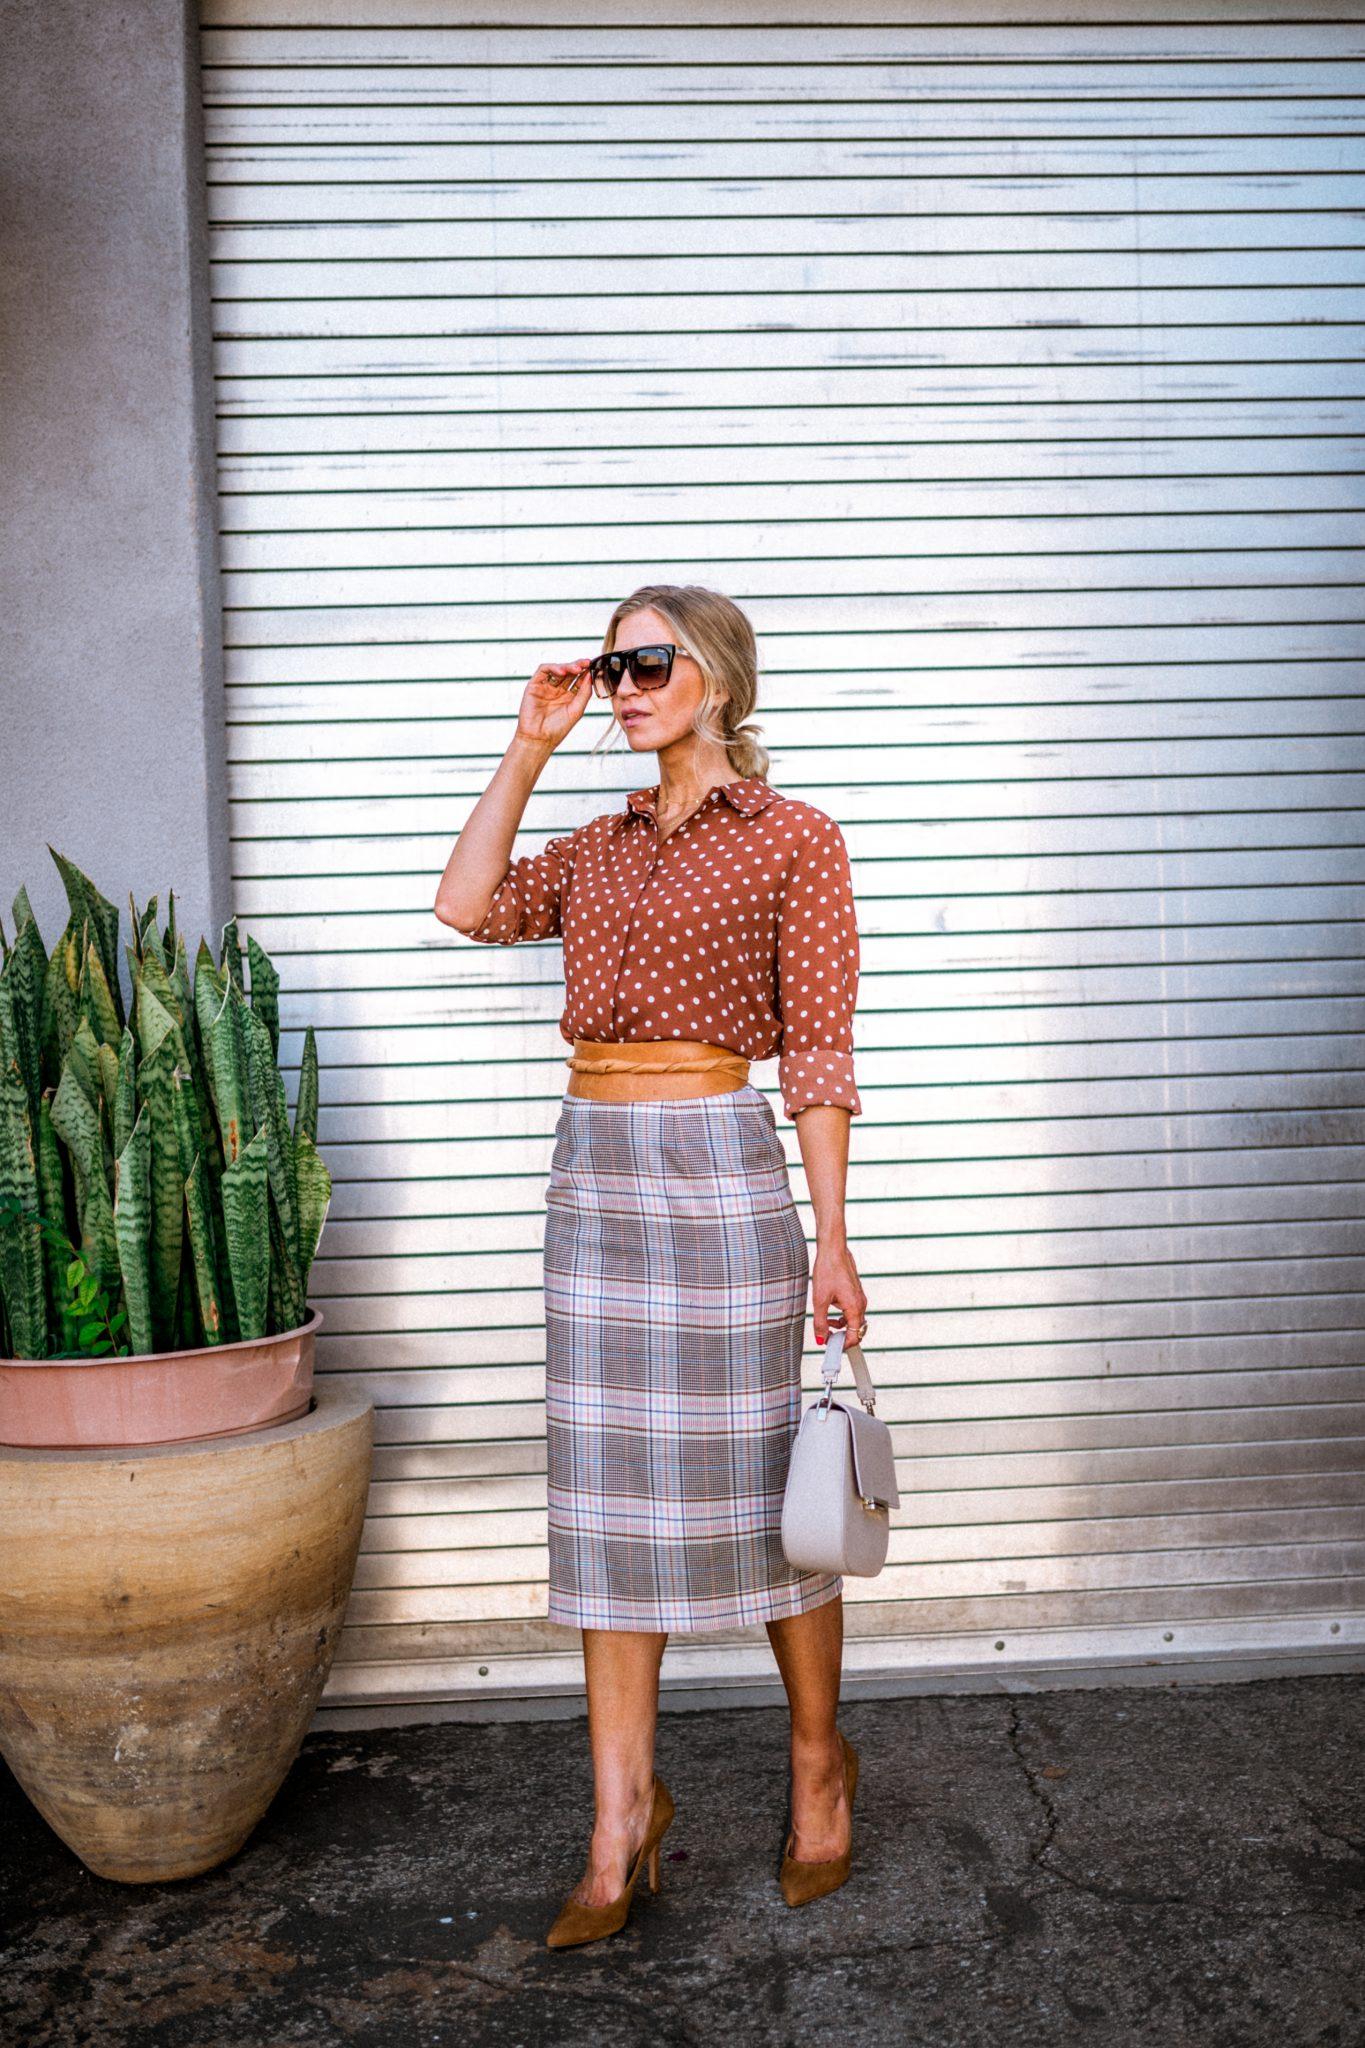 Plaid pencil skirt + polka dot top